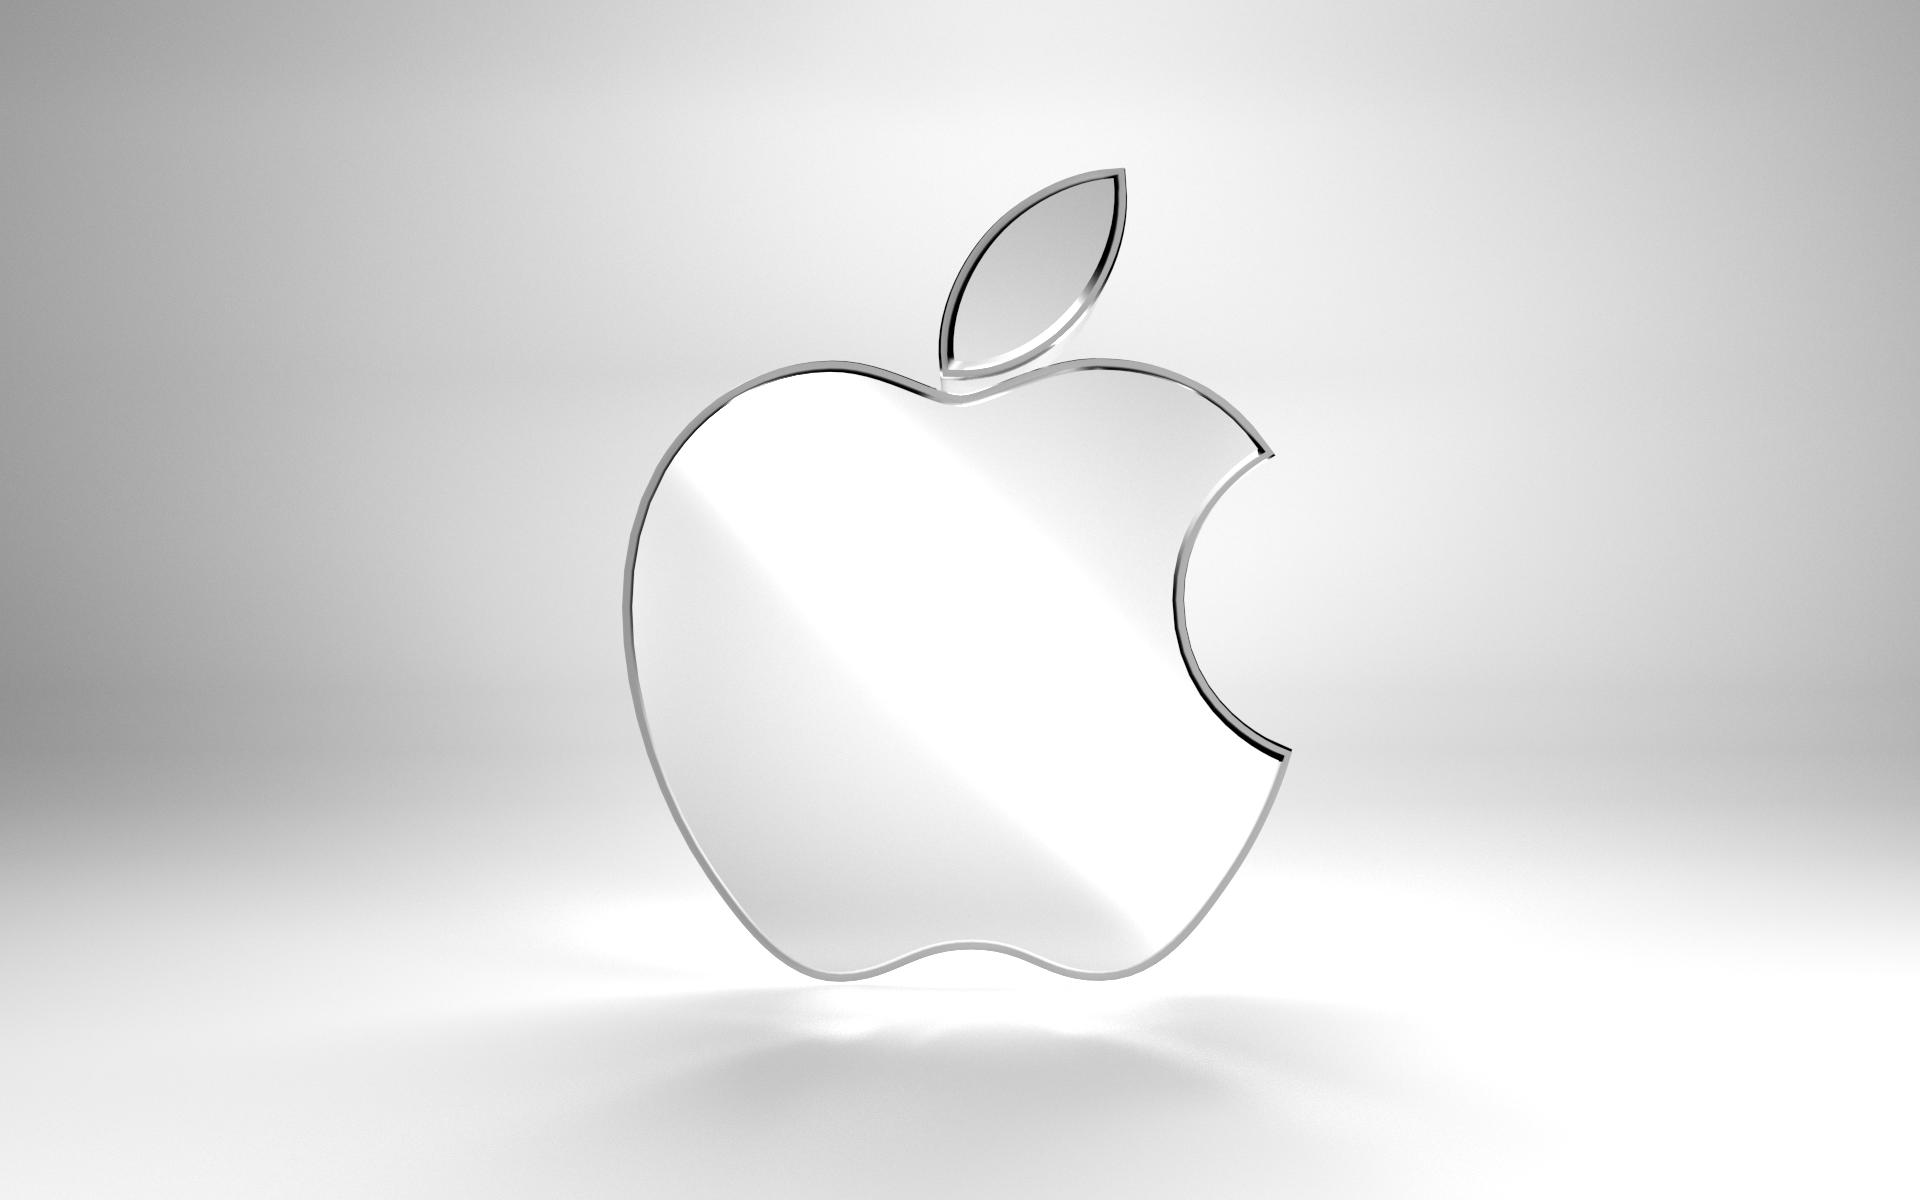 Metallic Apple Logo by Beanz239 on DeviantArt